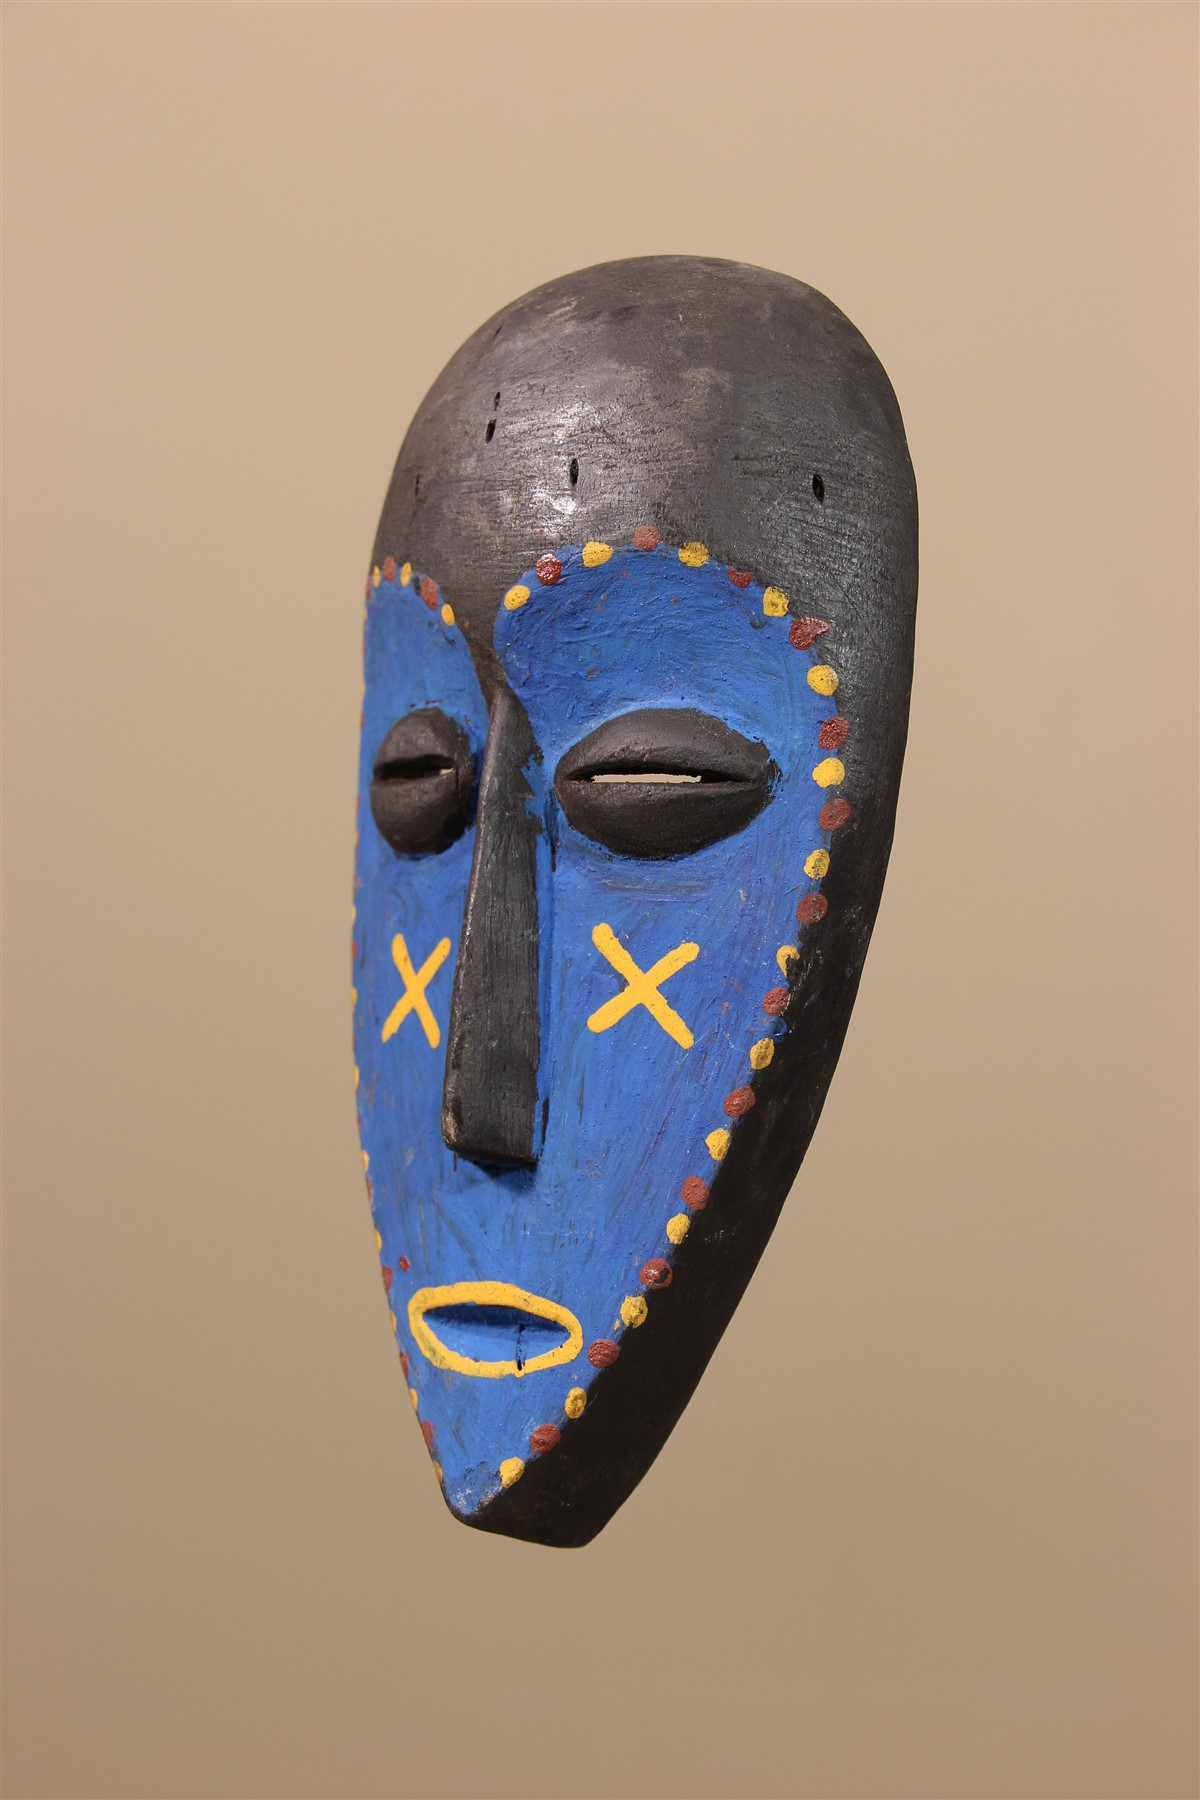 Petit masque Lega - Déco africaine - Art africain traditionnel